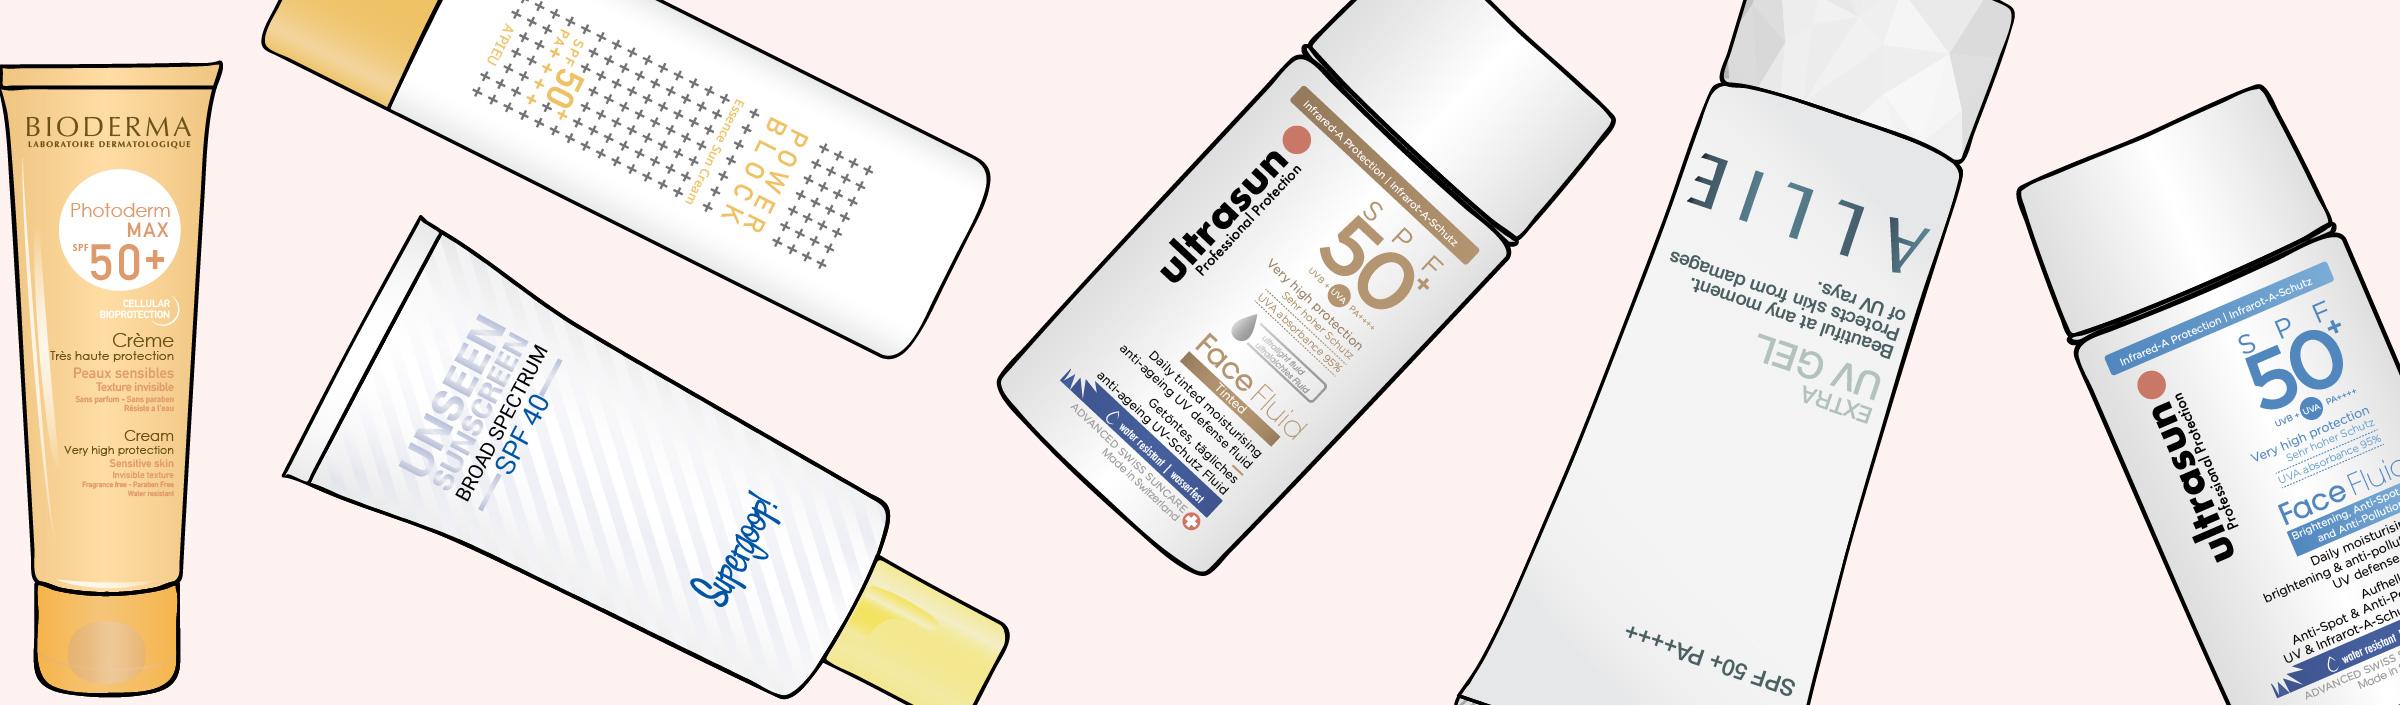 FDA+New+Sunscreen+Rules.jpg